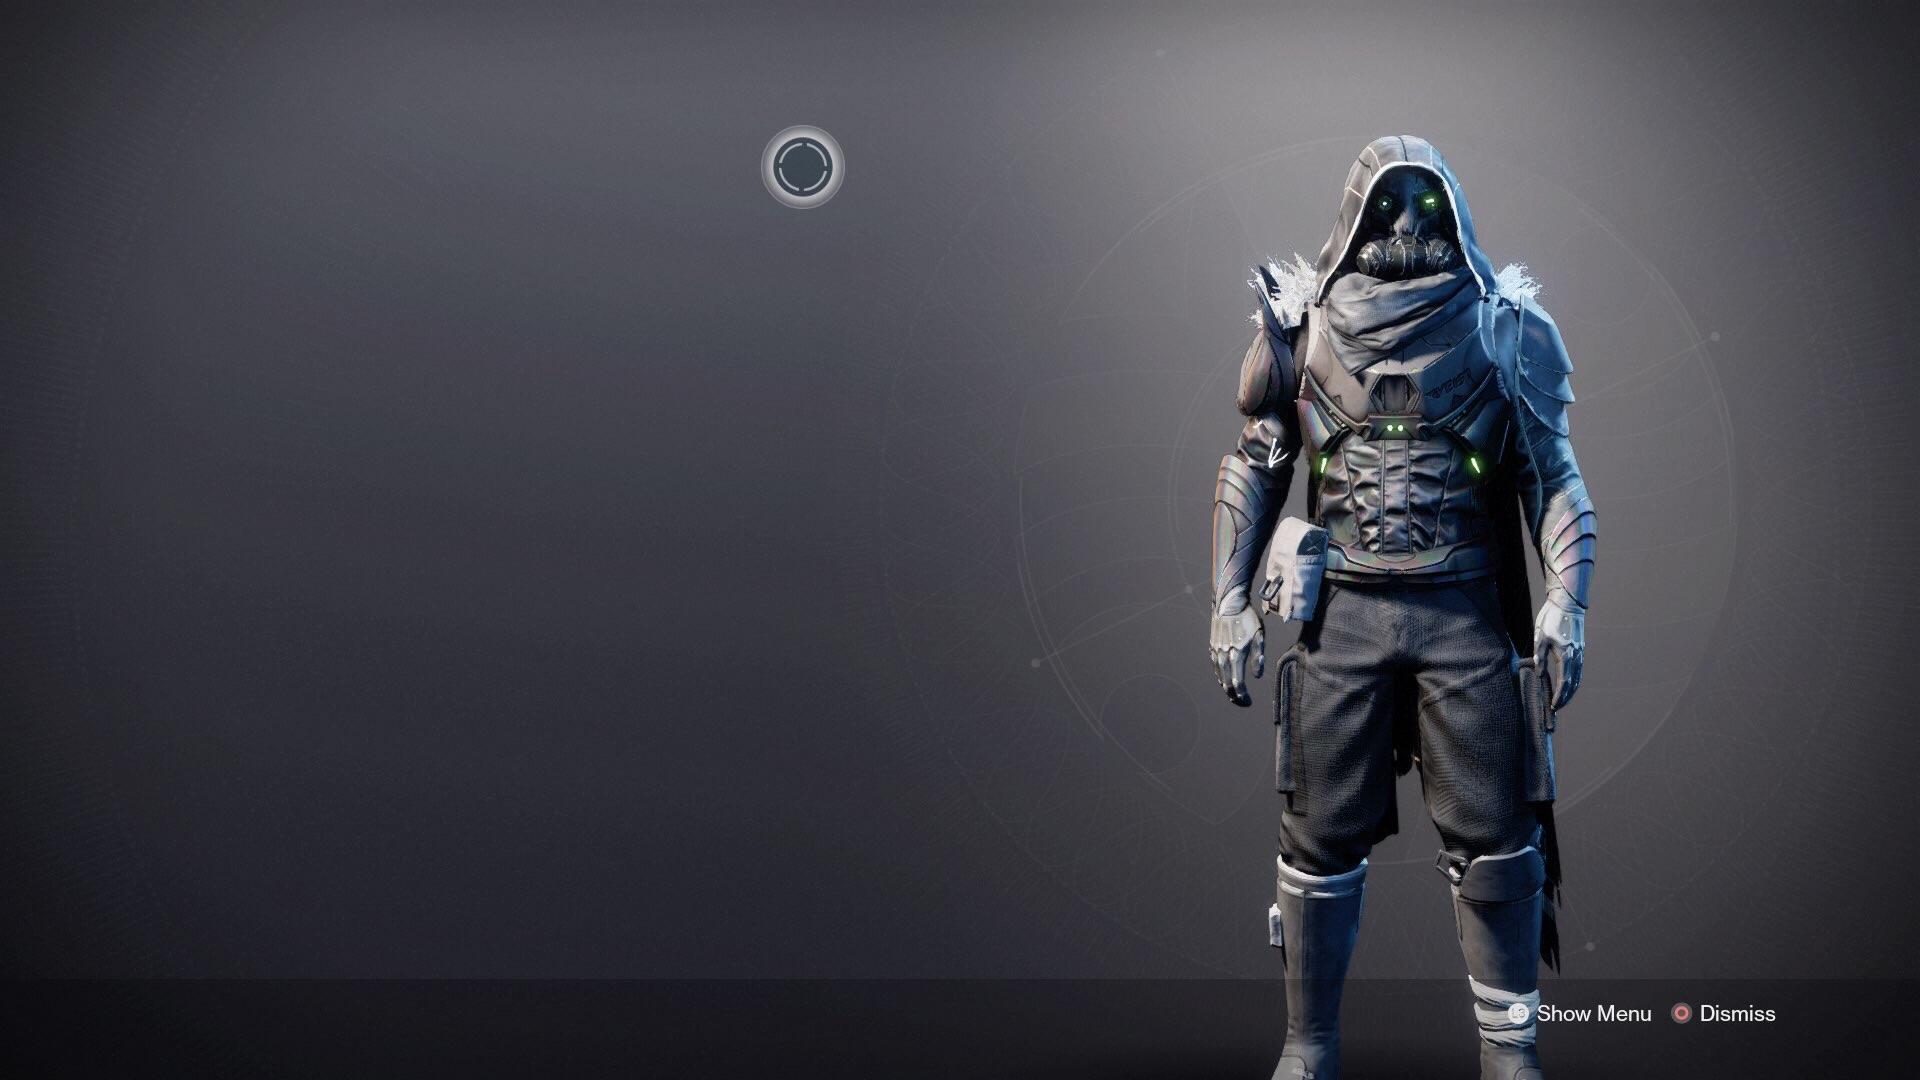 Veist Mercenary (Veist Assassin)